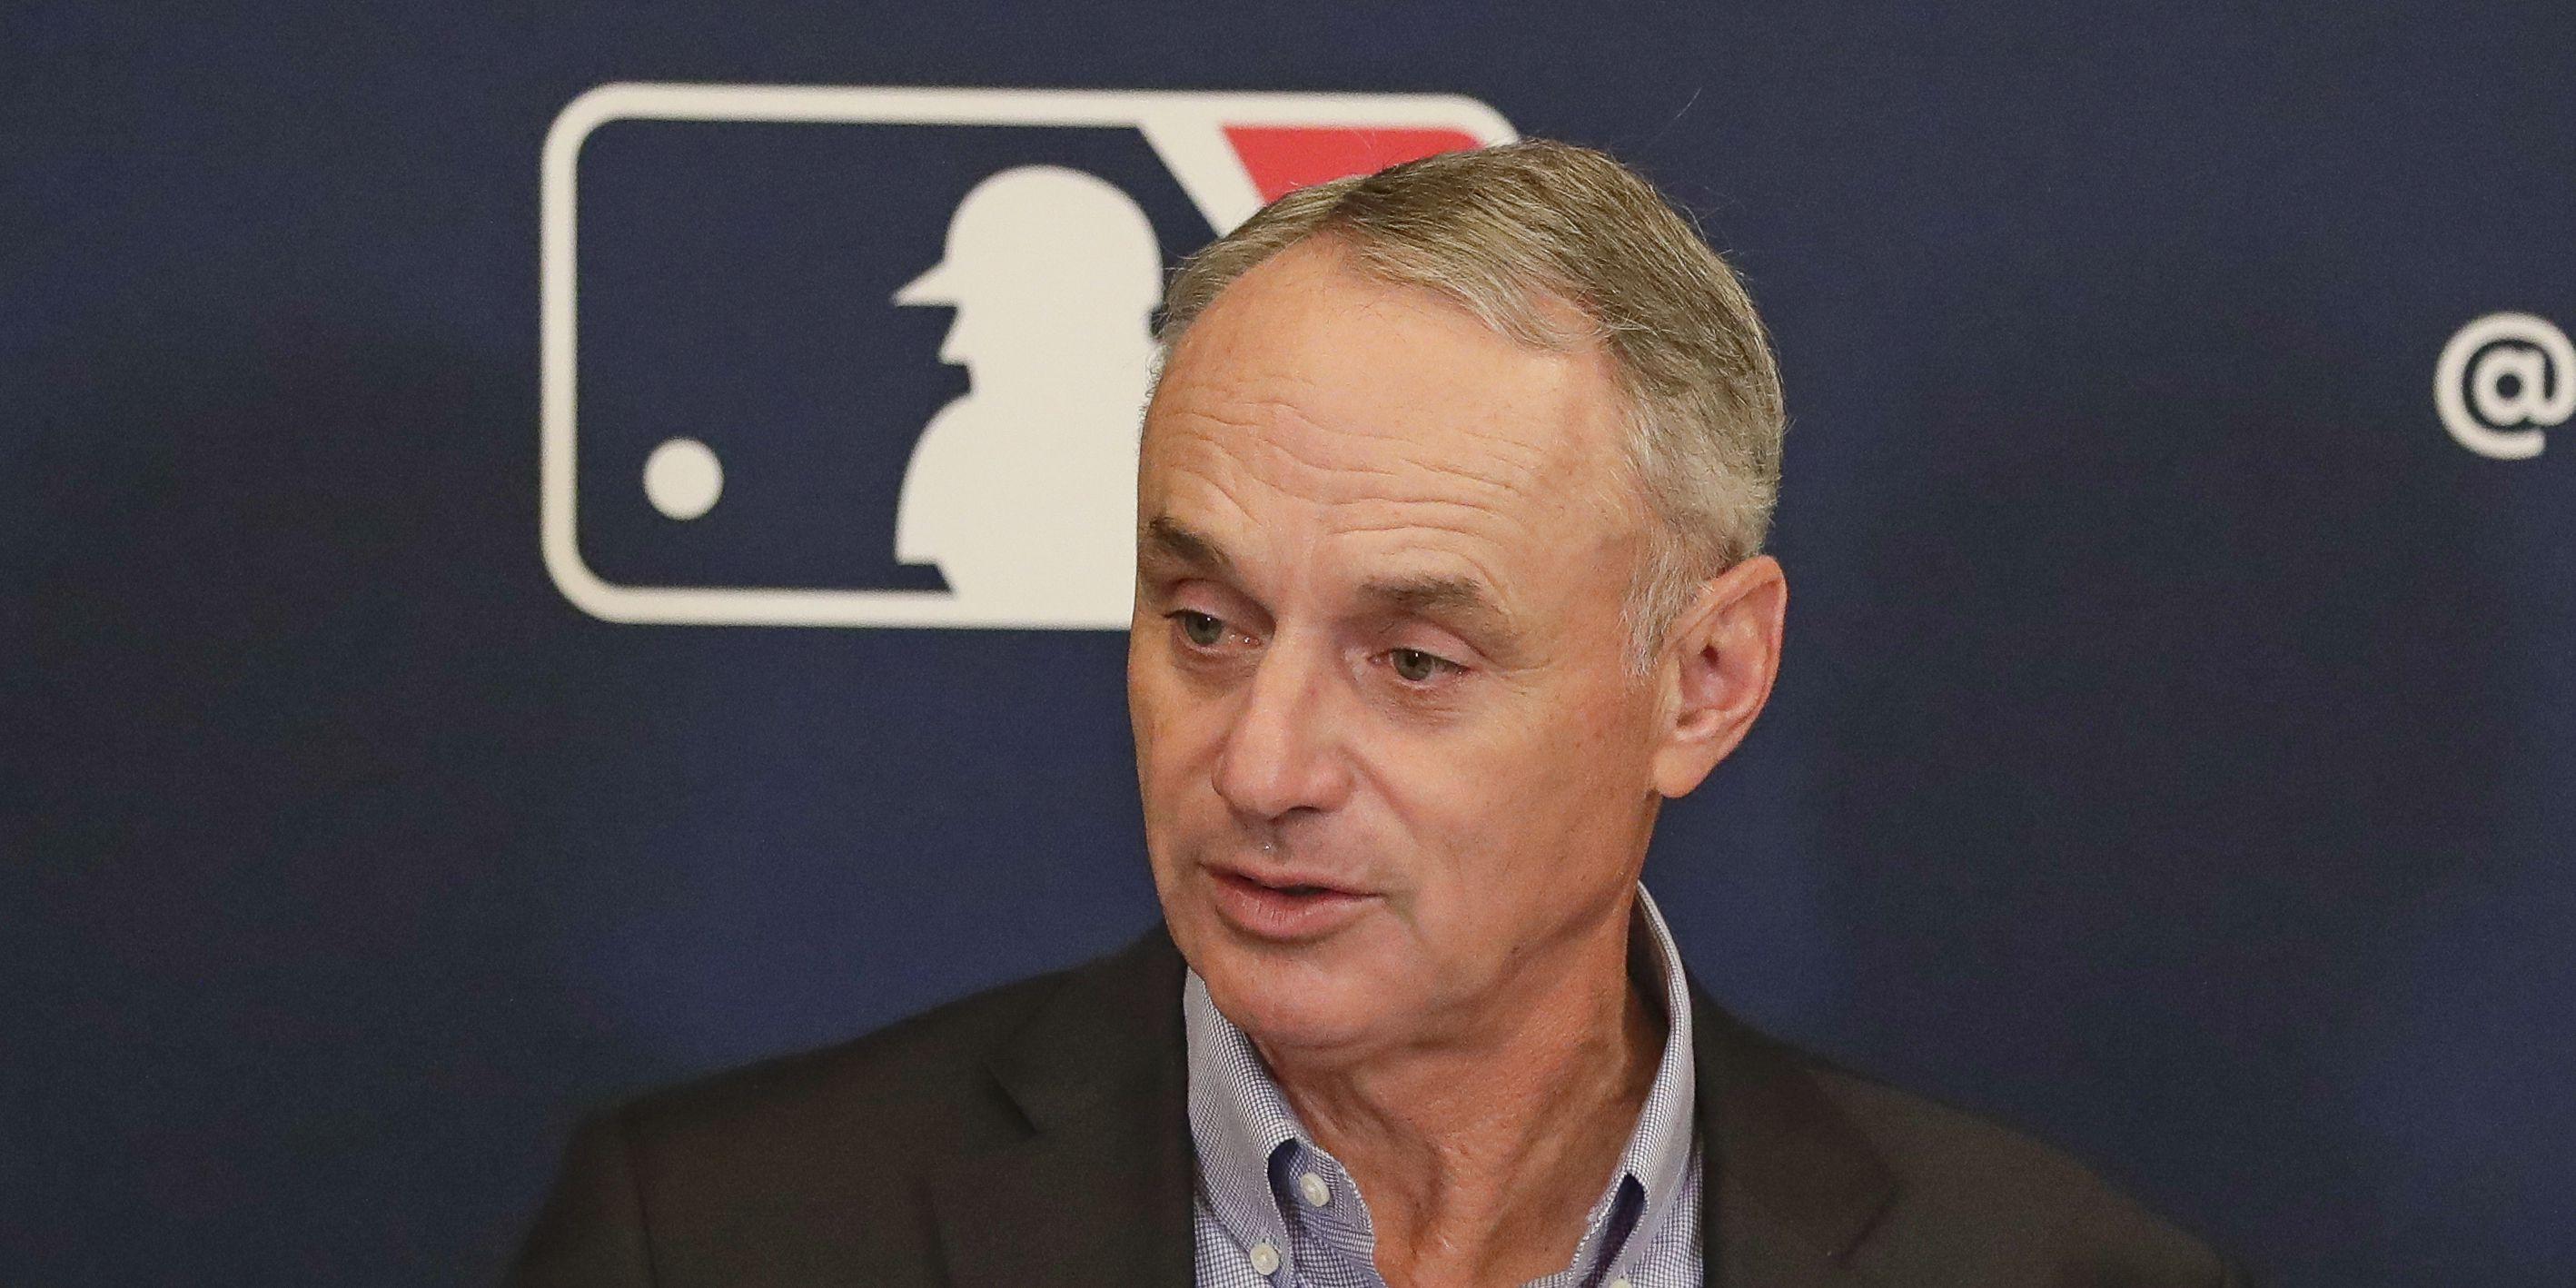 MLB teams pledge $30 million to support ballpark employees